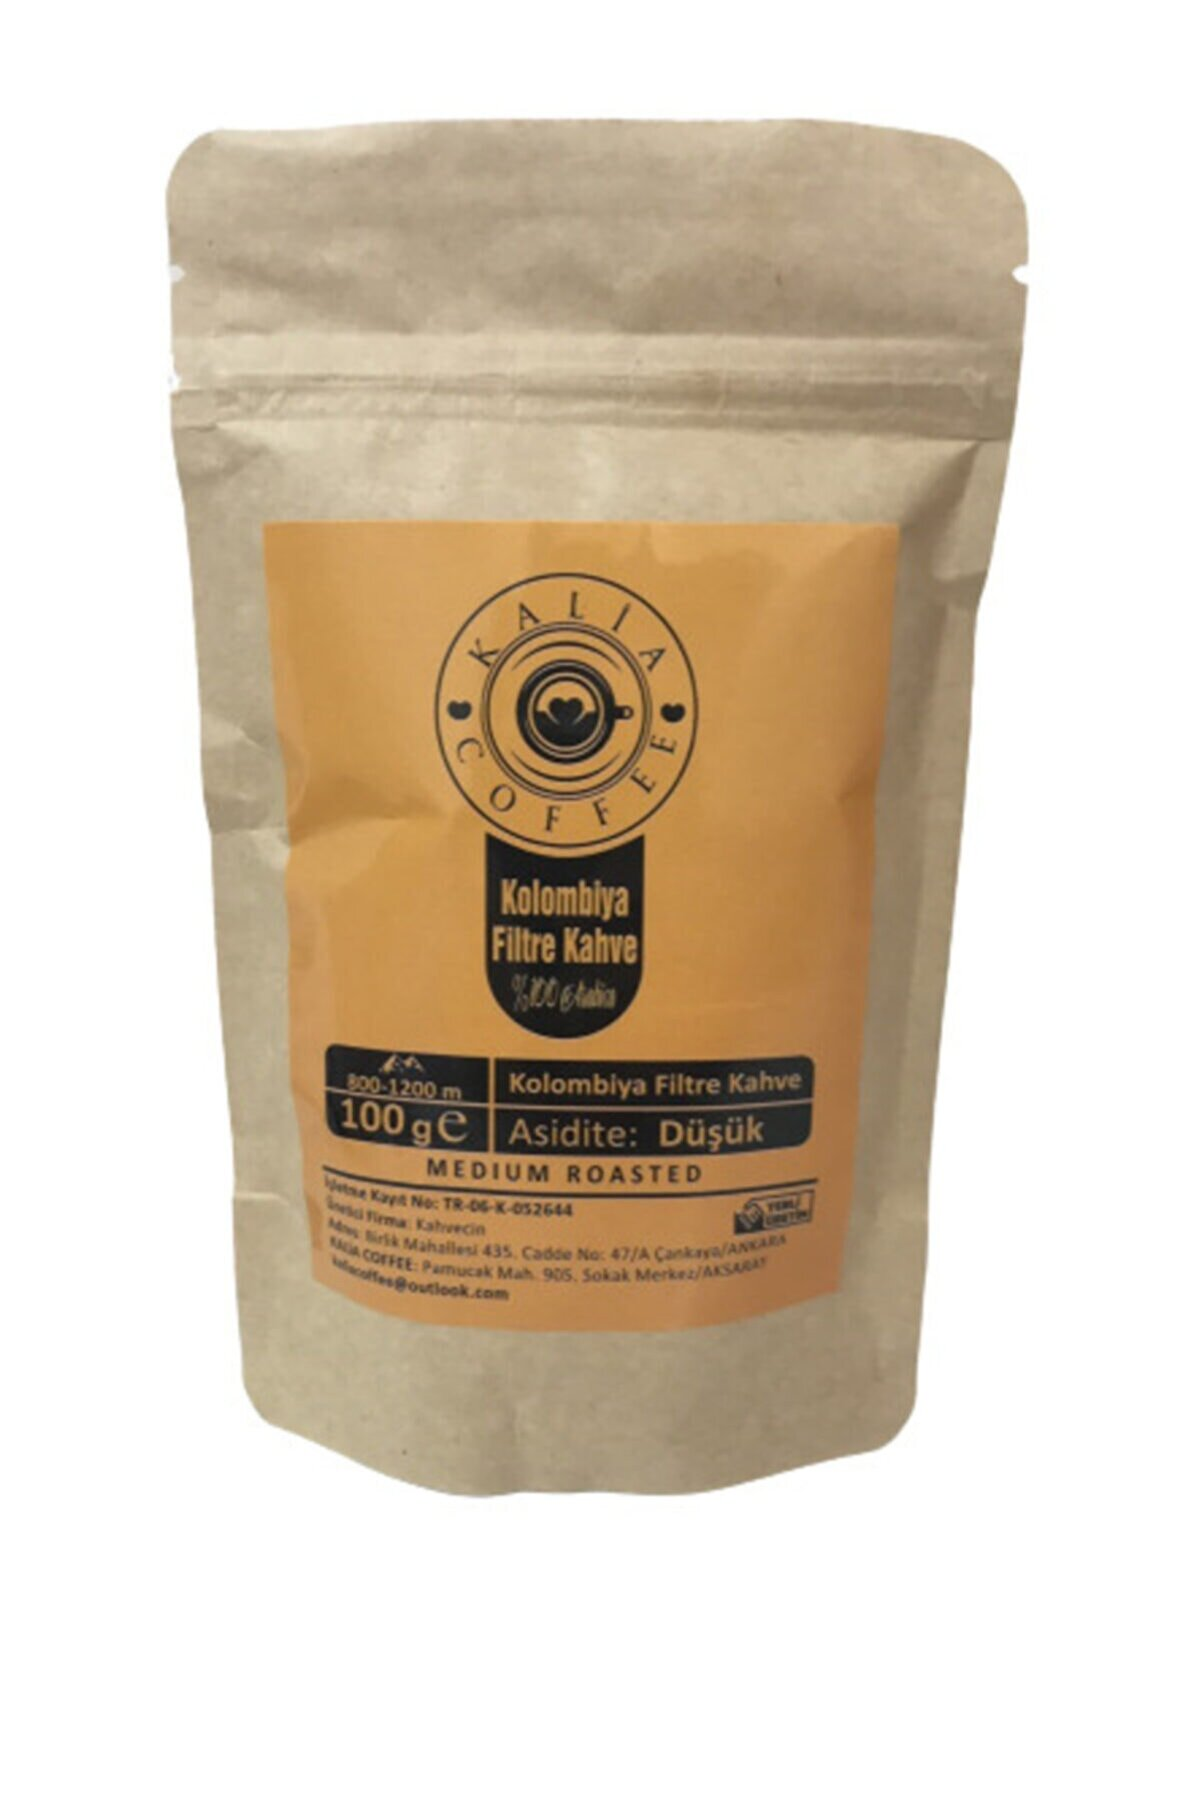 KALİA COFFEE Kolombiya Filtre Kahve